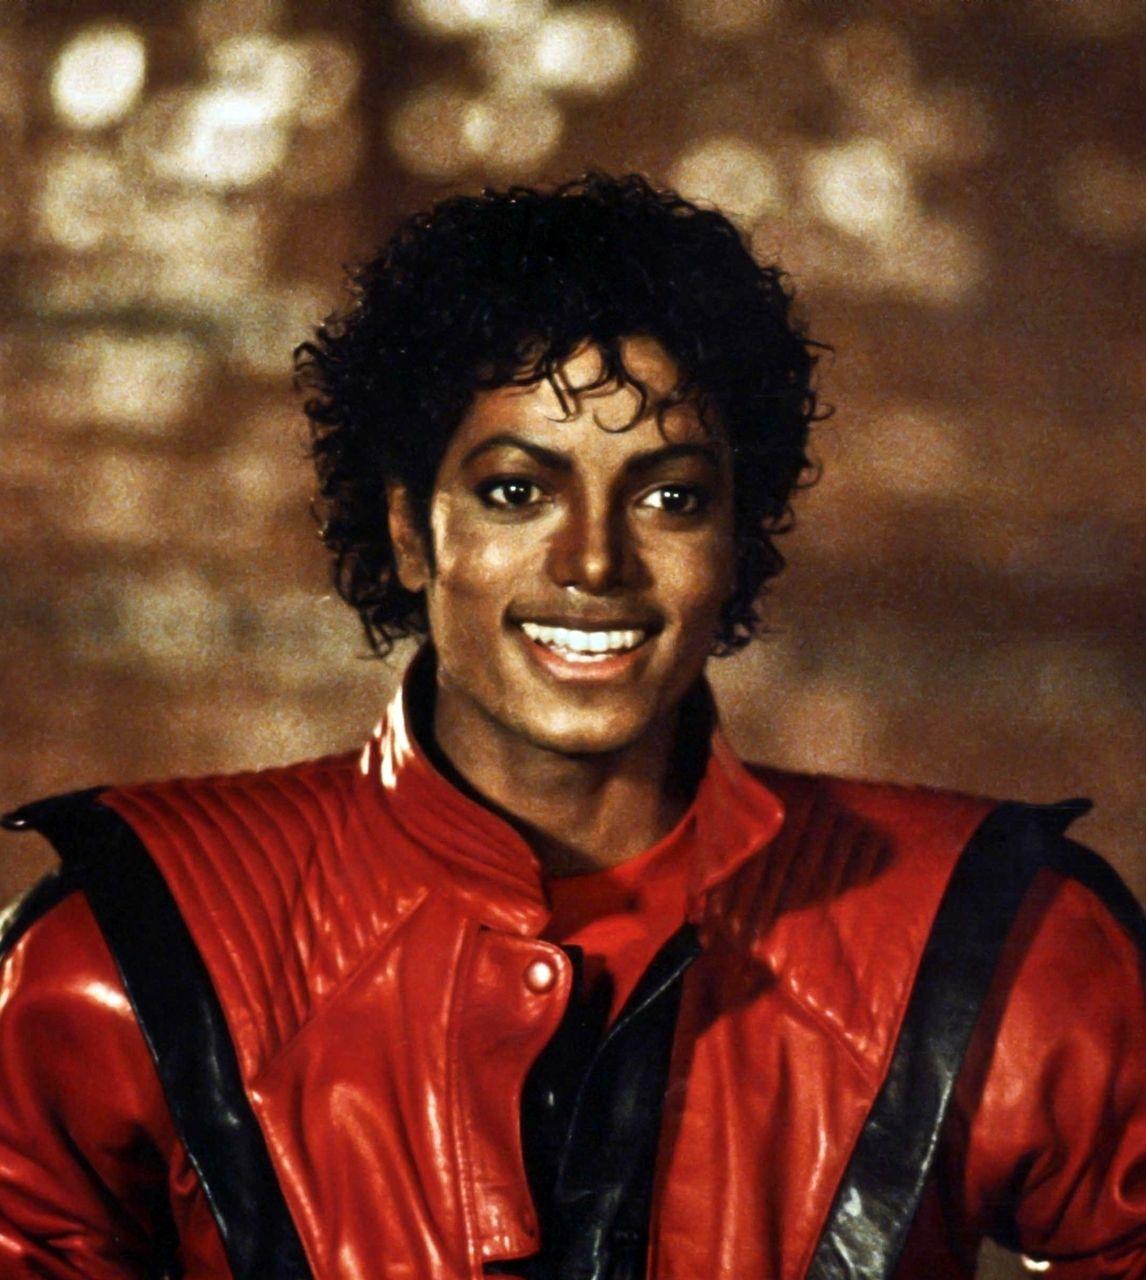 Michael Jackson Photo Michael The Thriller Jackson Michael Jackson Thriller Michael Jackson Thriller Jackson